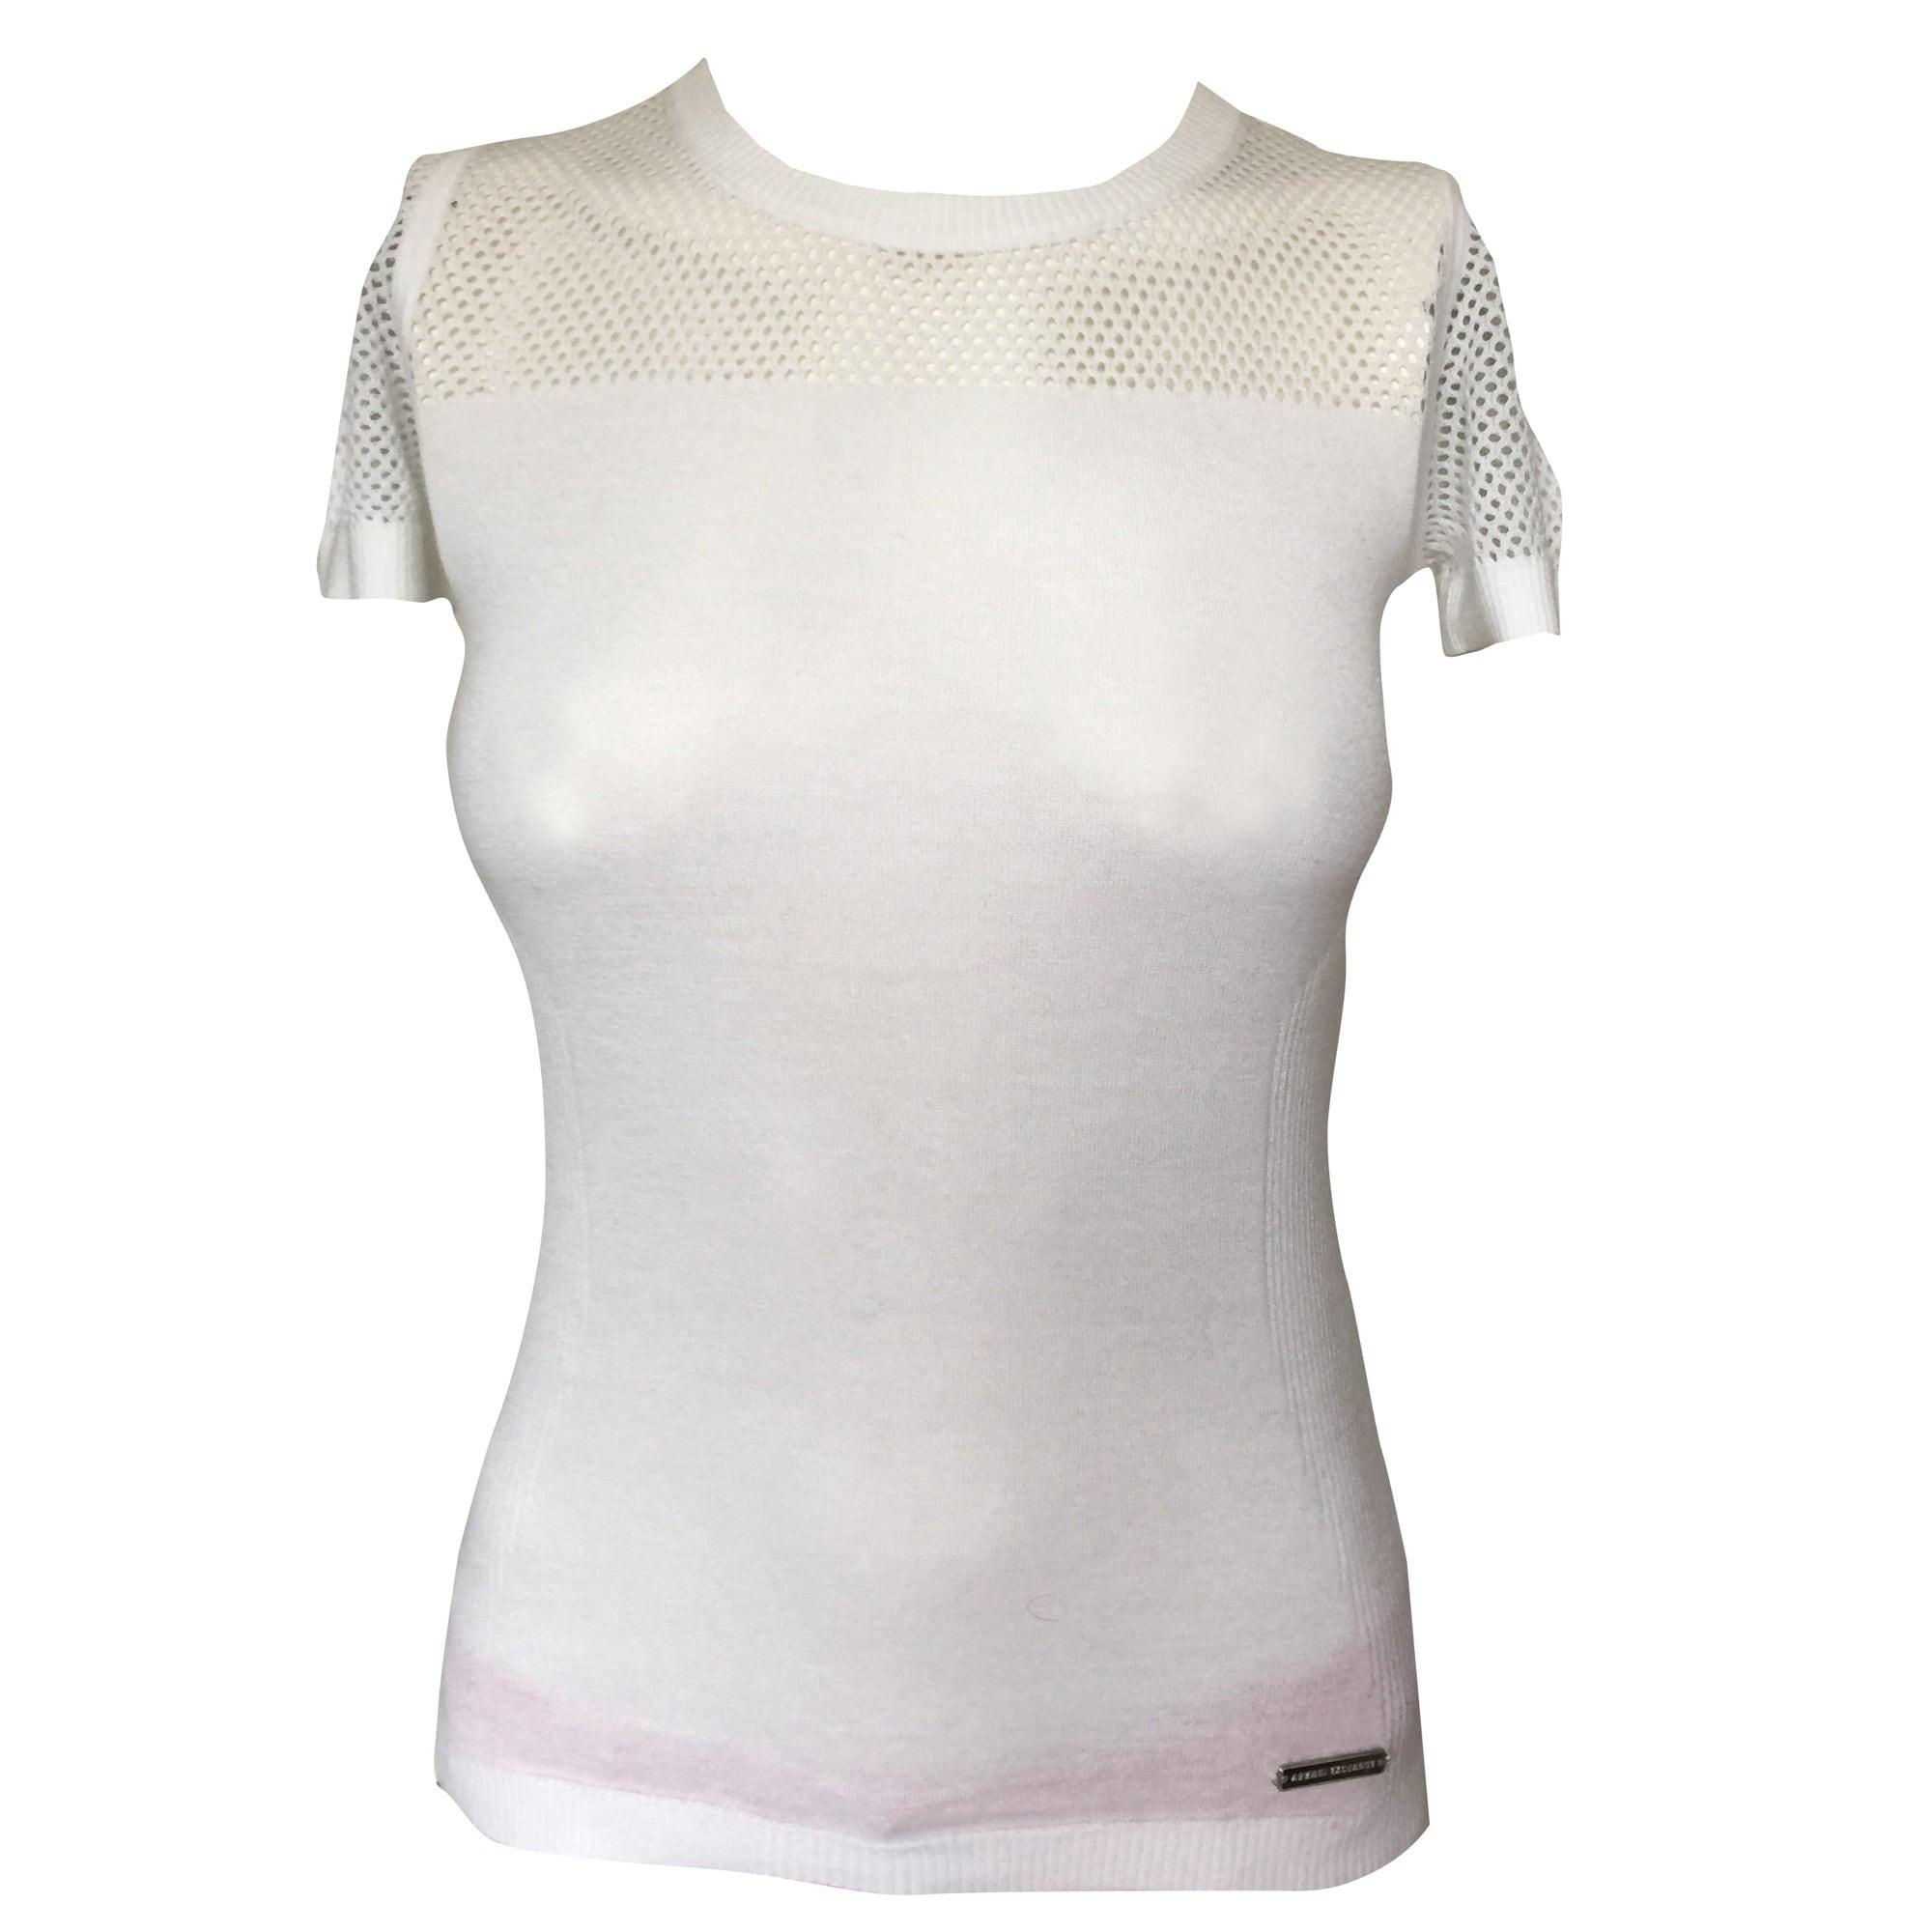 Exchange Blanc s Top 4880106 Shirt T1 36 Tee Armani qwXxWtxHv0